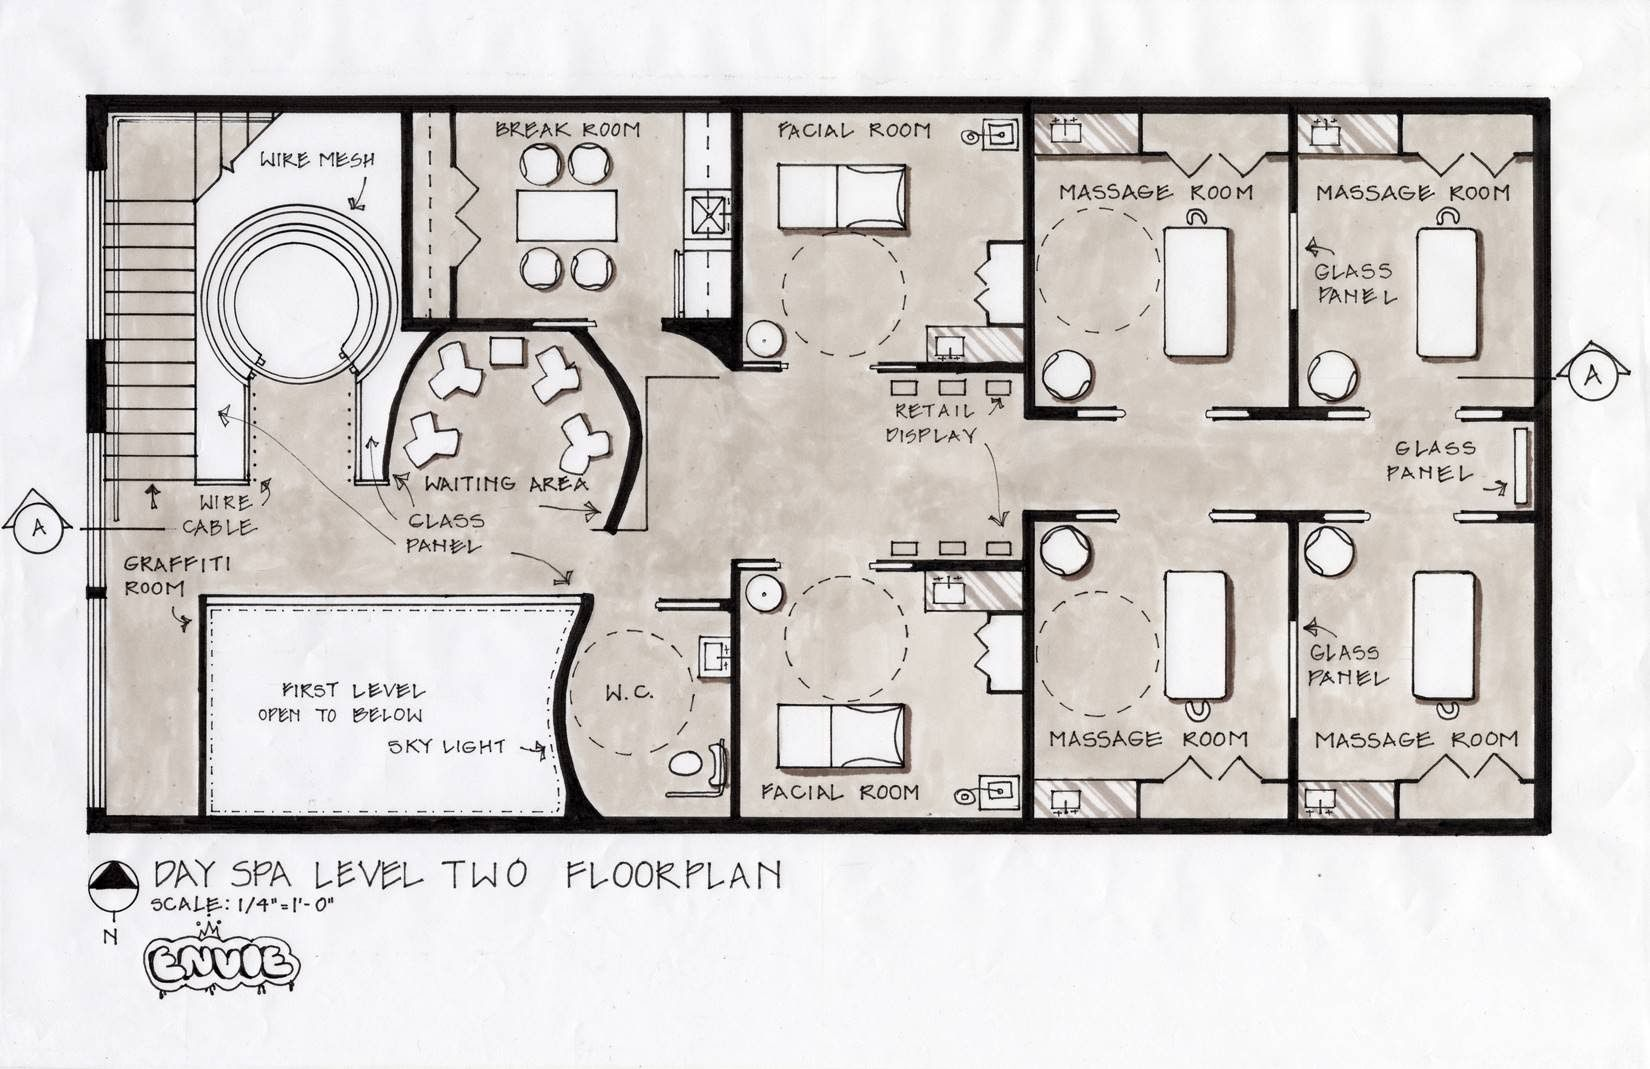 Spa floor plans design concept fifth avenue new york city also rh co pinterest